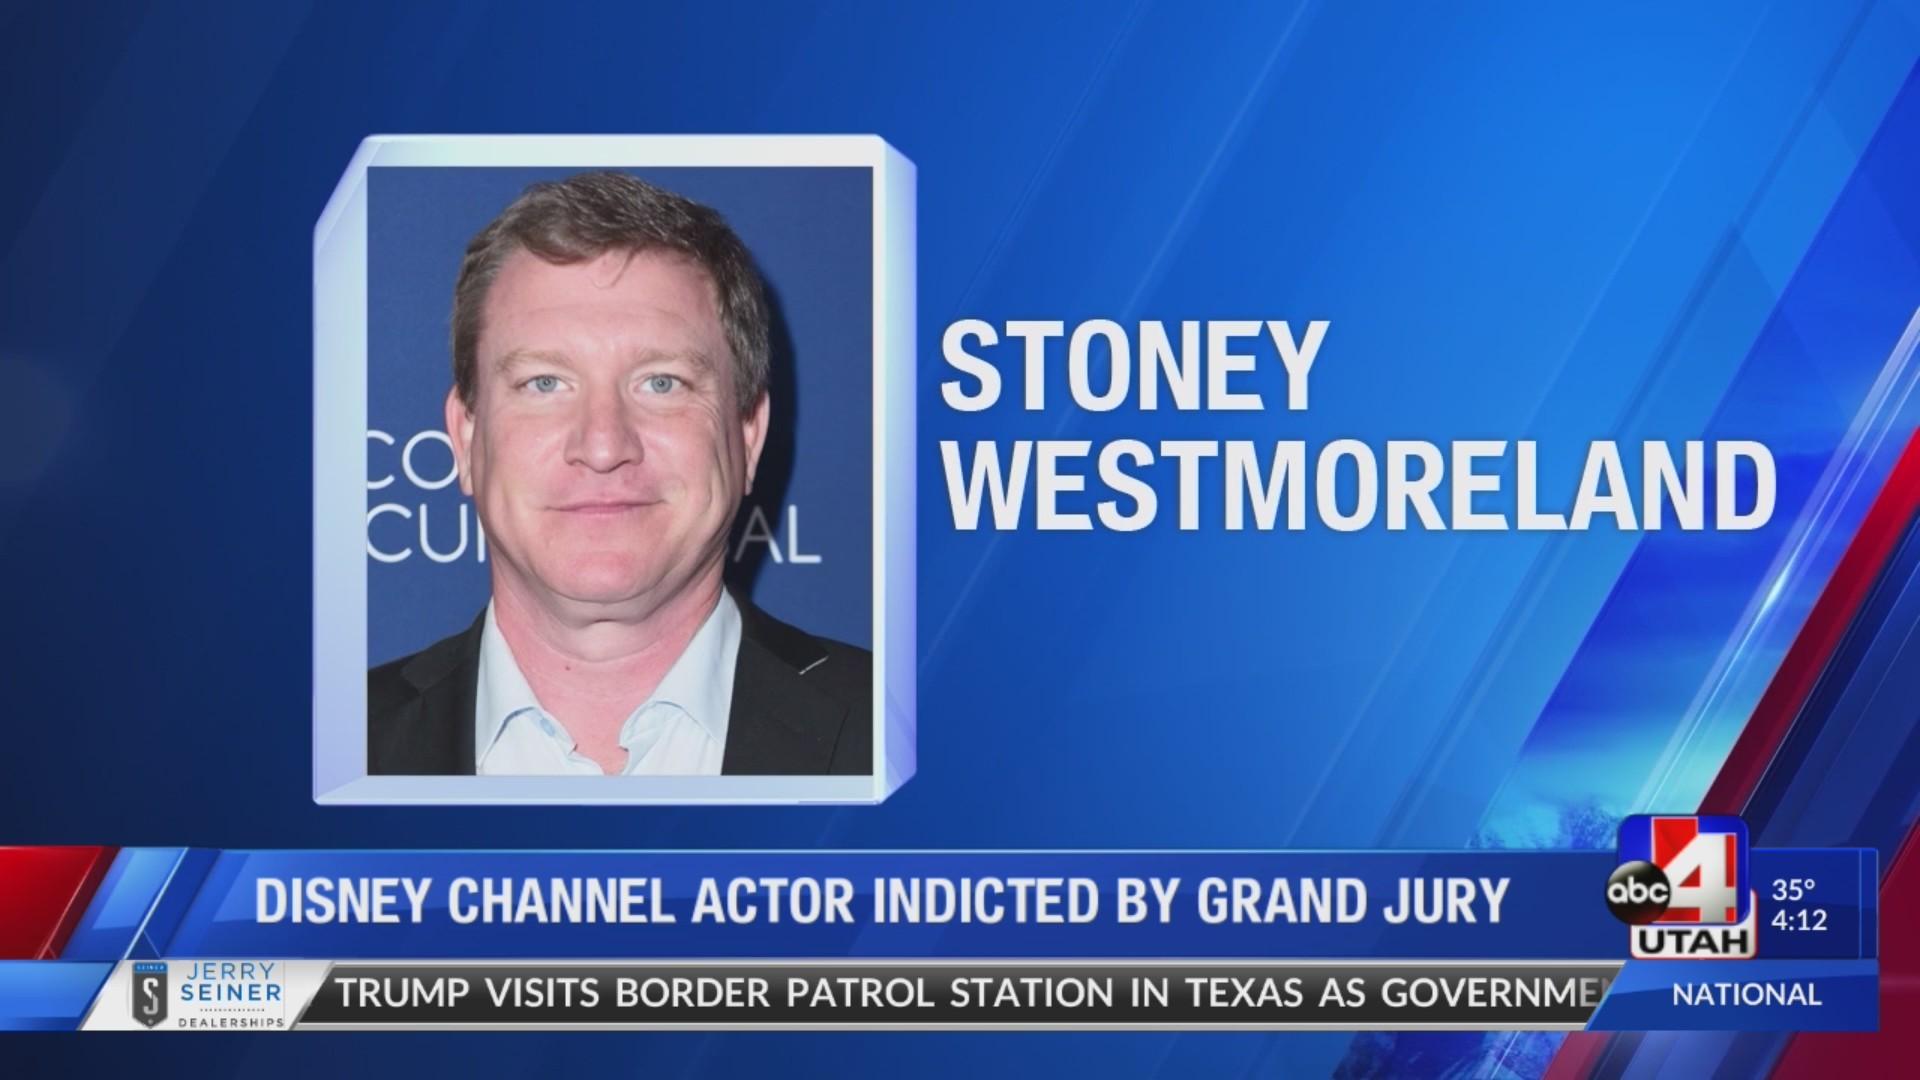 Stoney Westmoreland indicted by grand jury